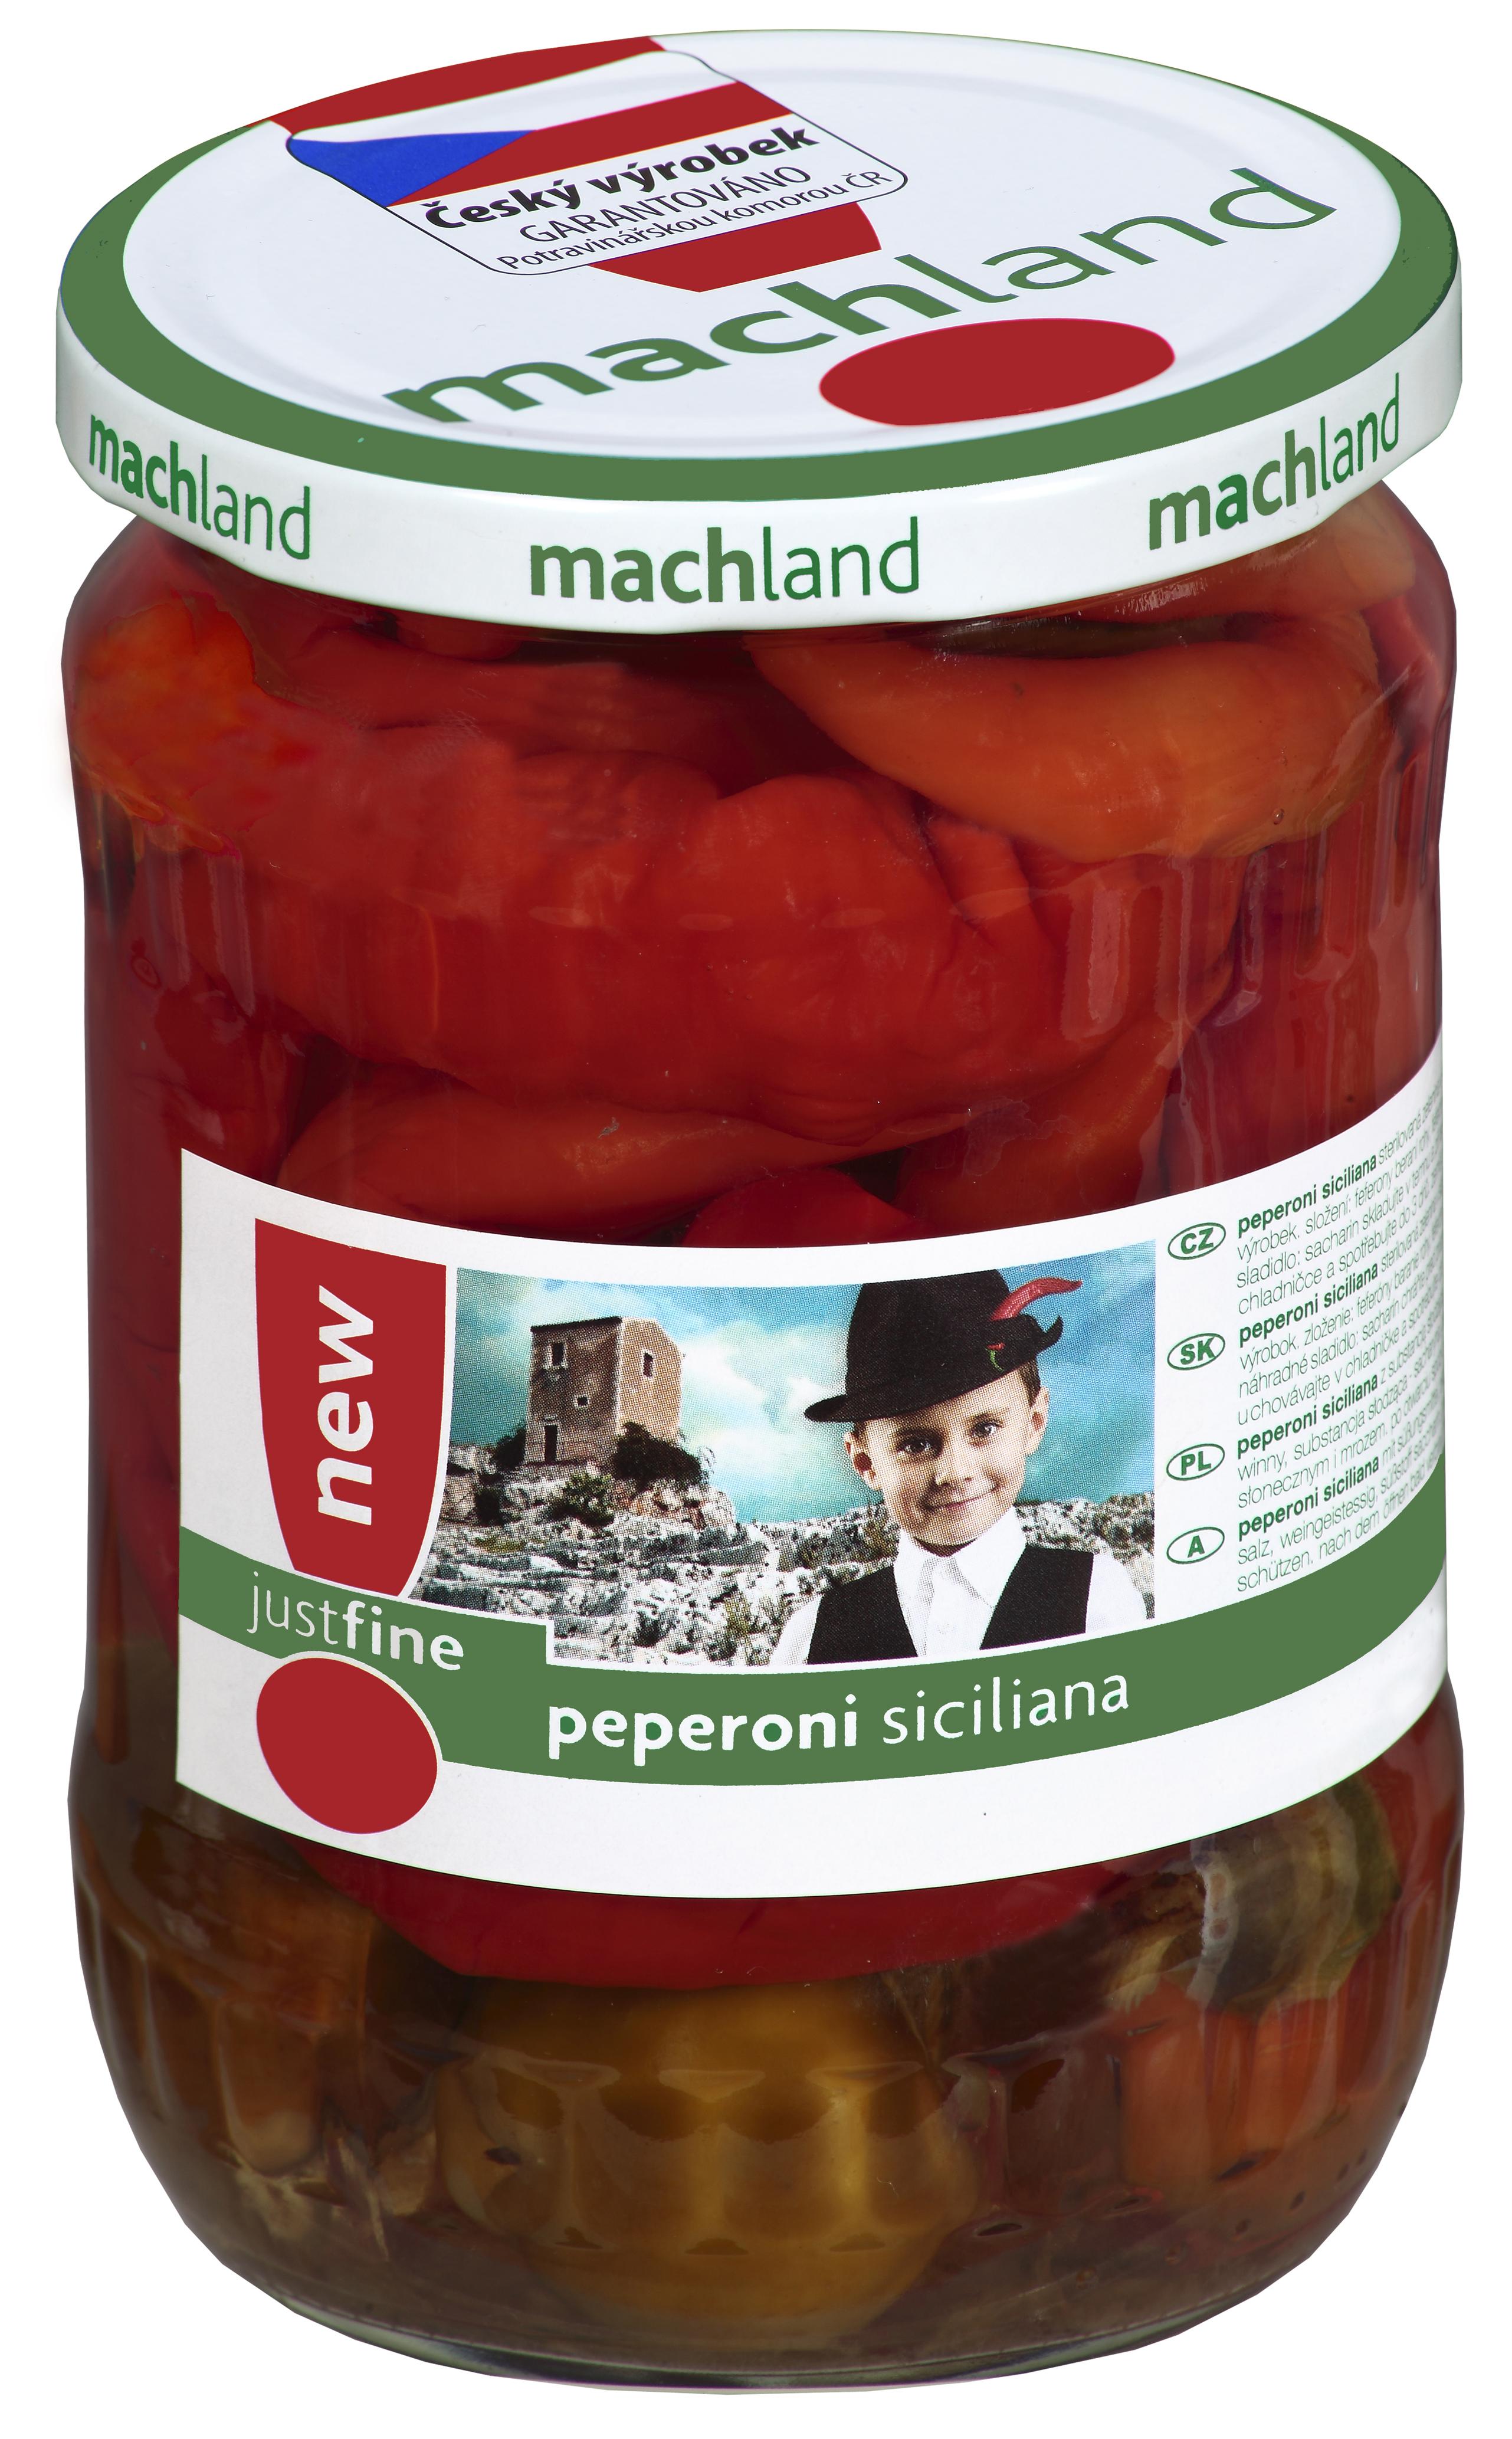 Značka Peperoni siciliana 580ml